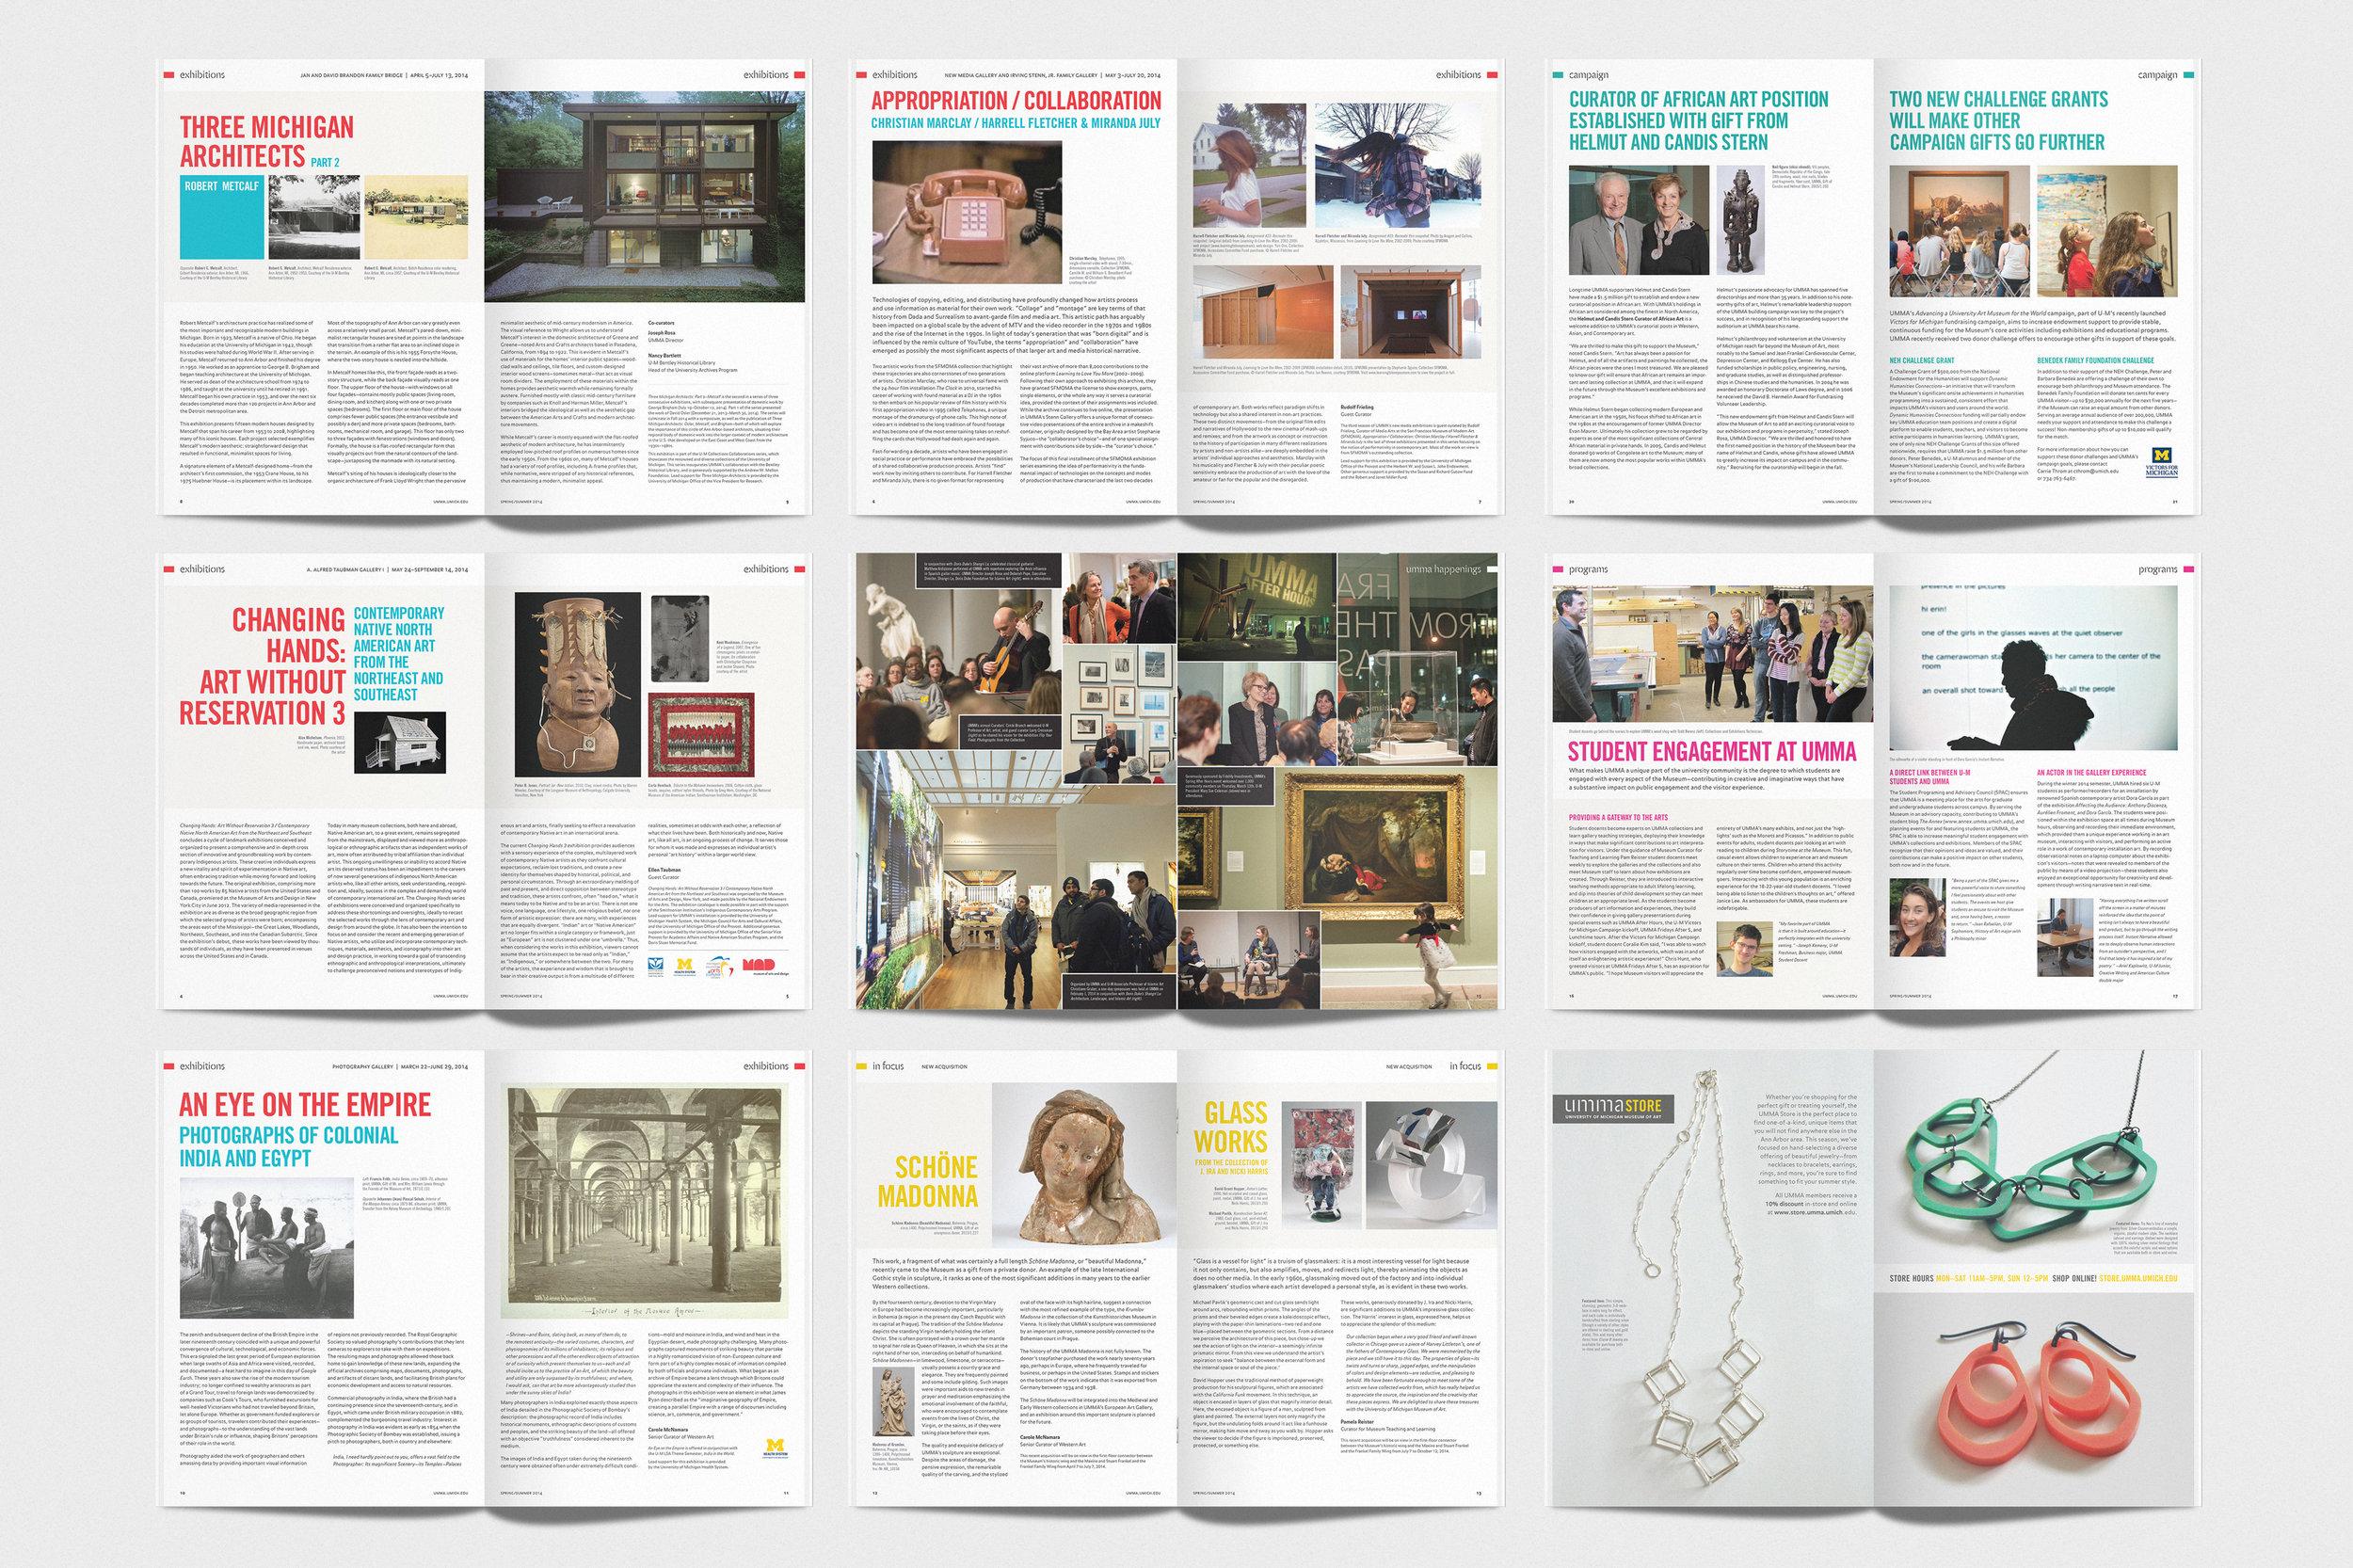 UMMA_Magazine_interiors_4.jpg